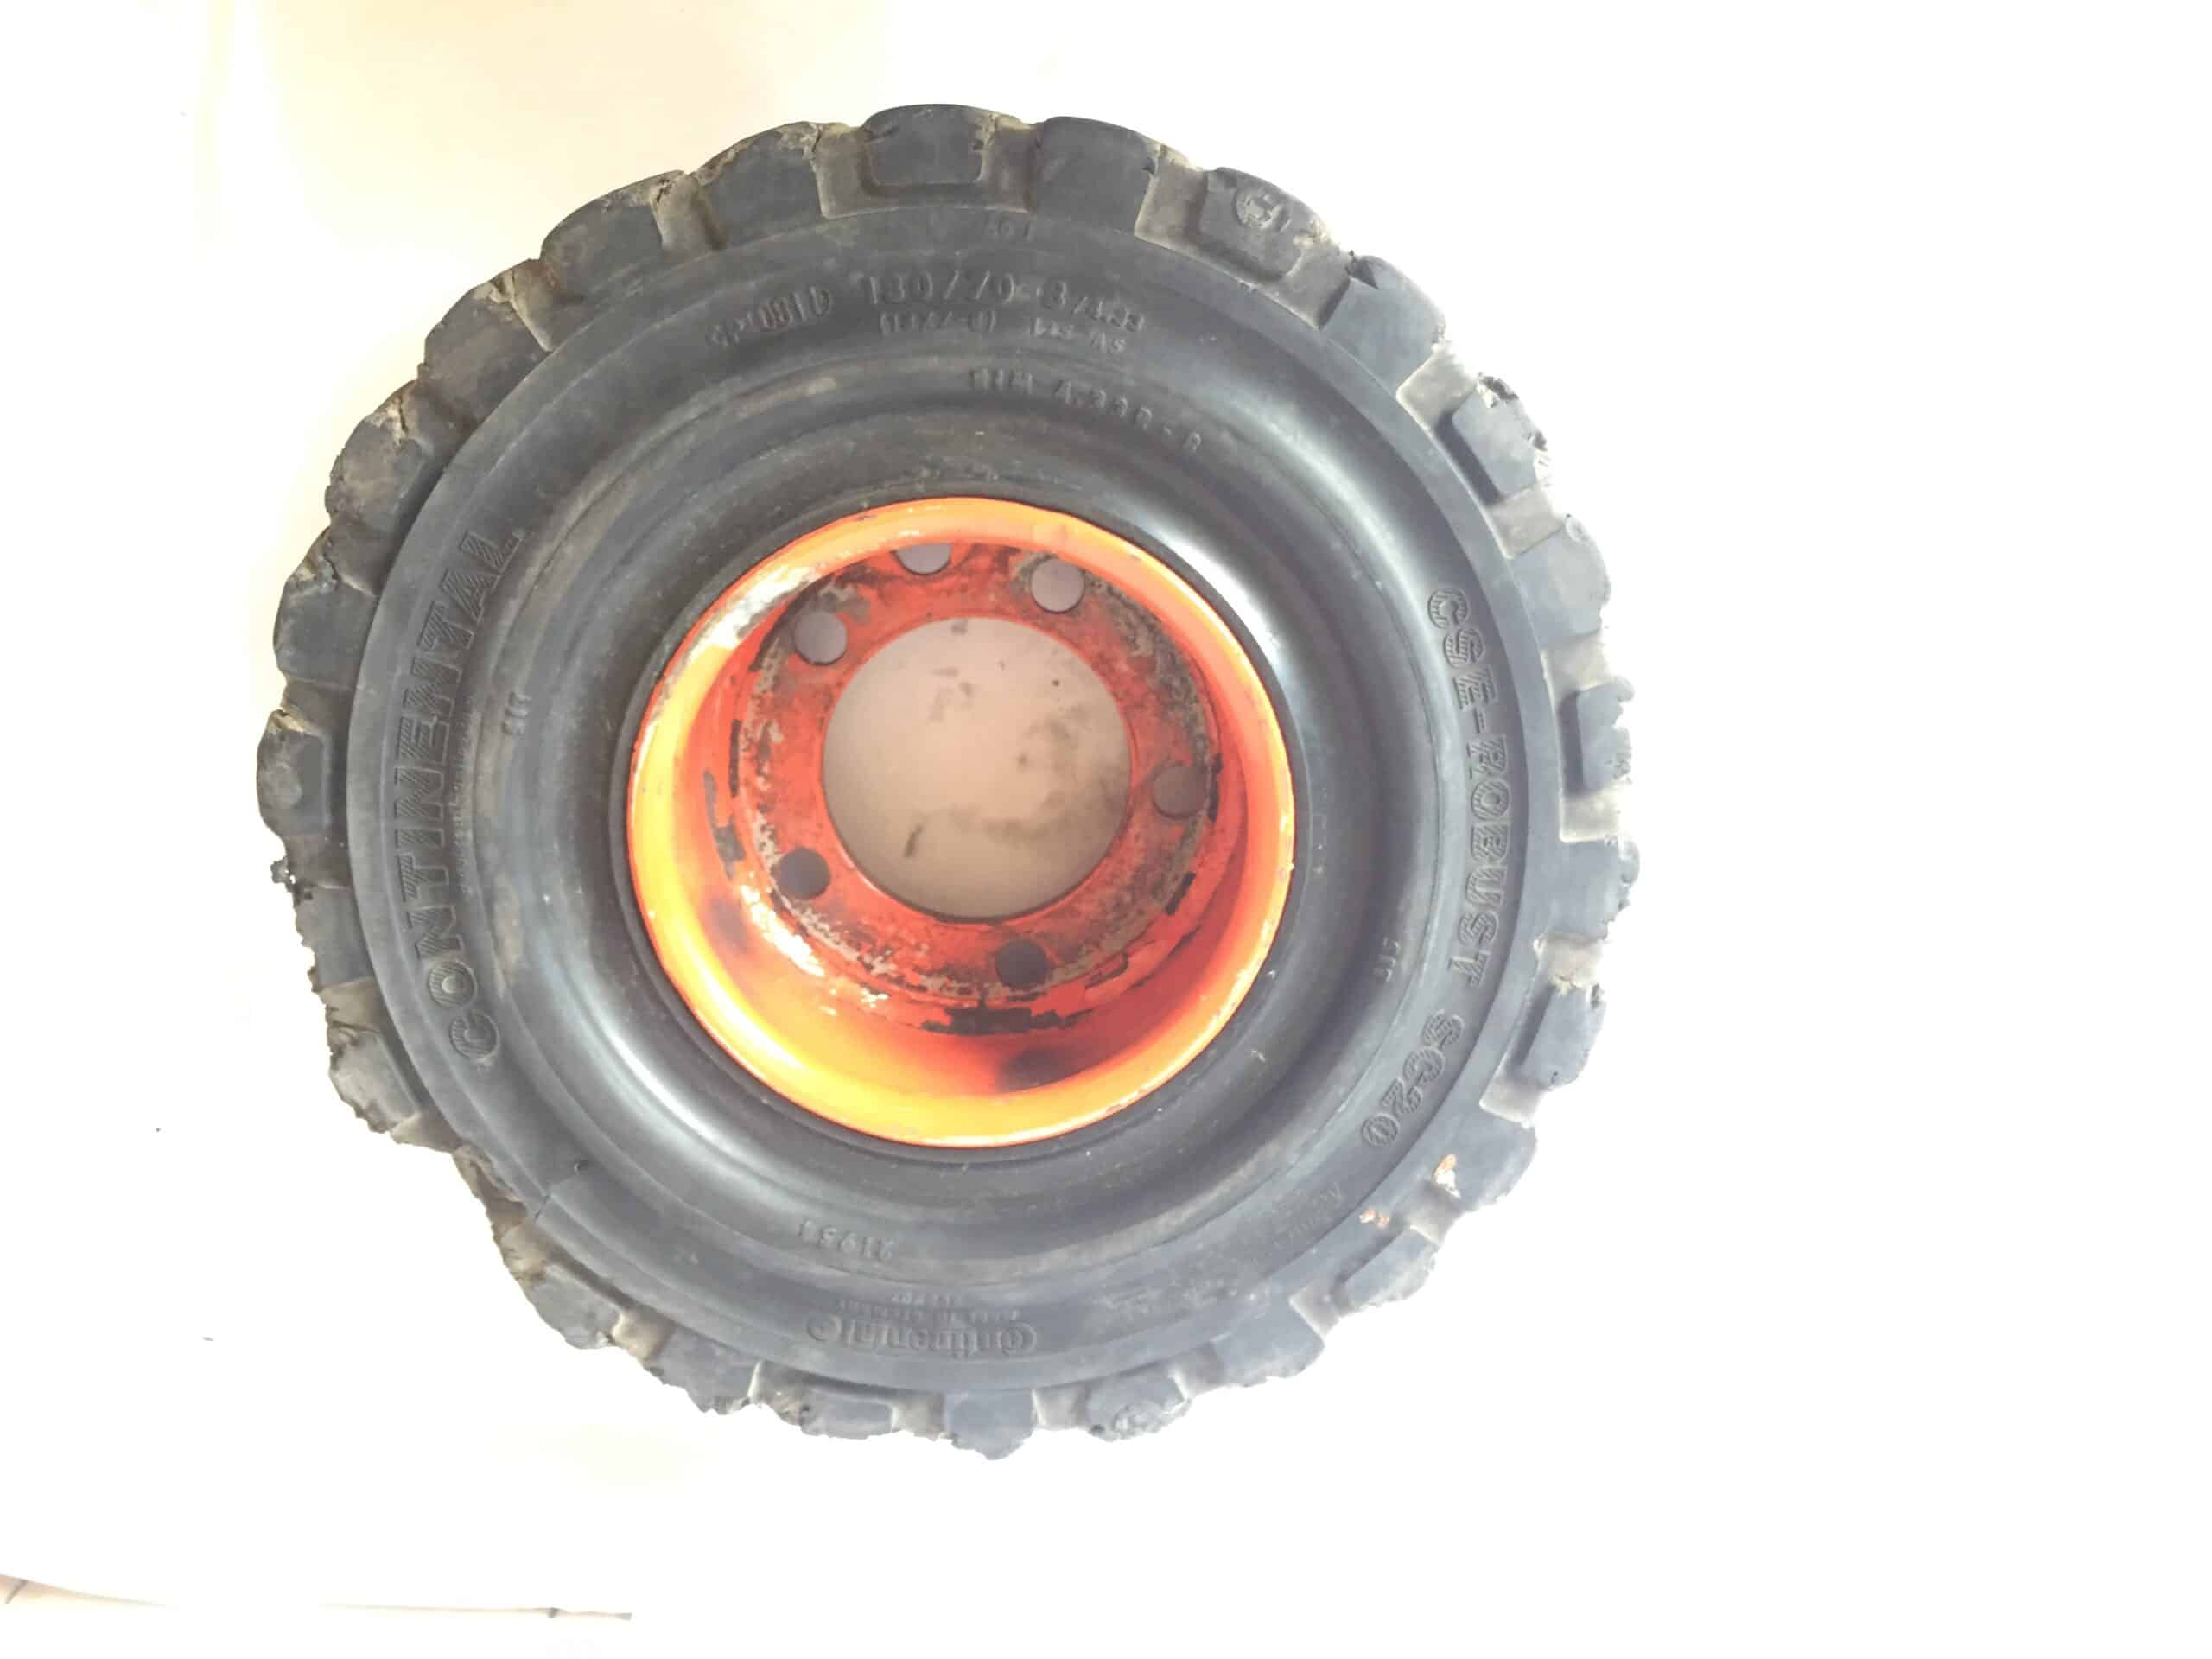   Front Wheel   Fazl-e-Rasheed and Company August 2021